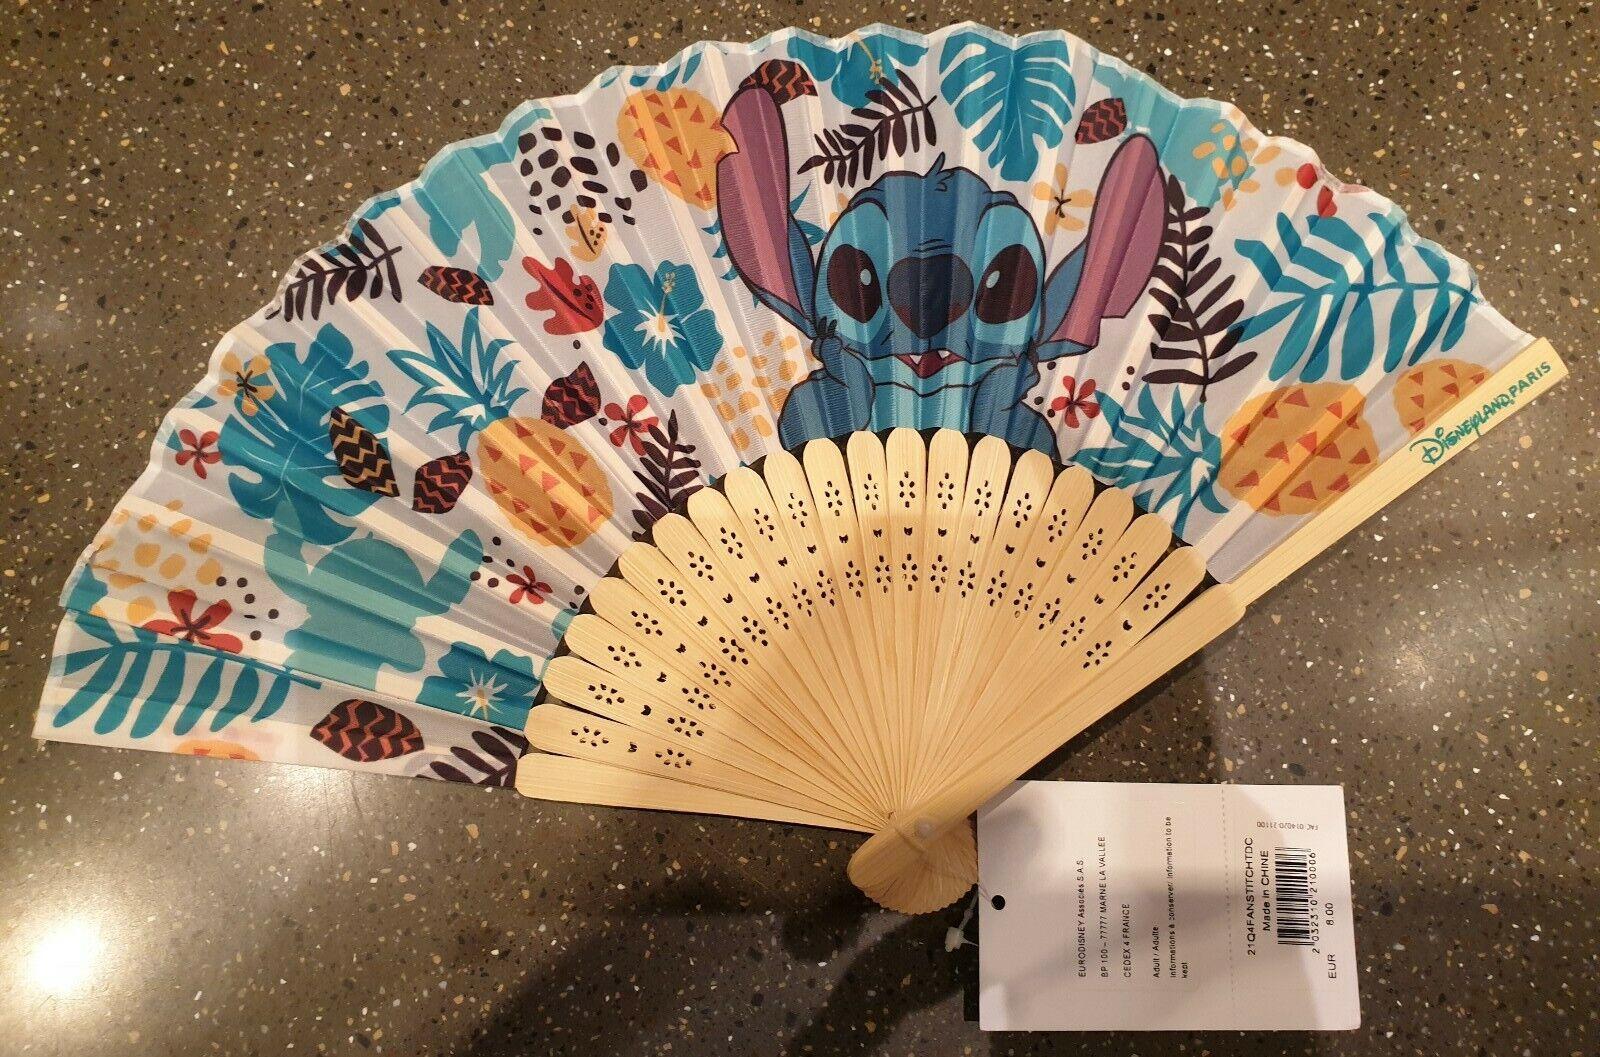 21q4 fan/fan stitch tdc disneyland paris